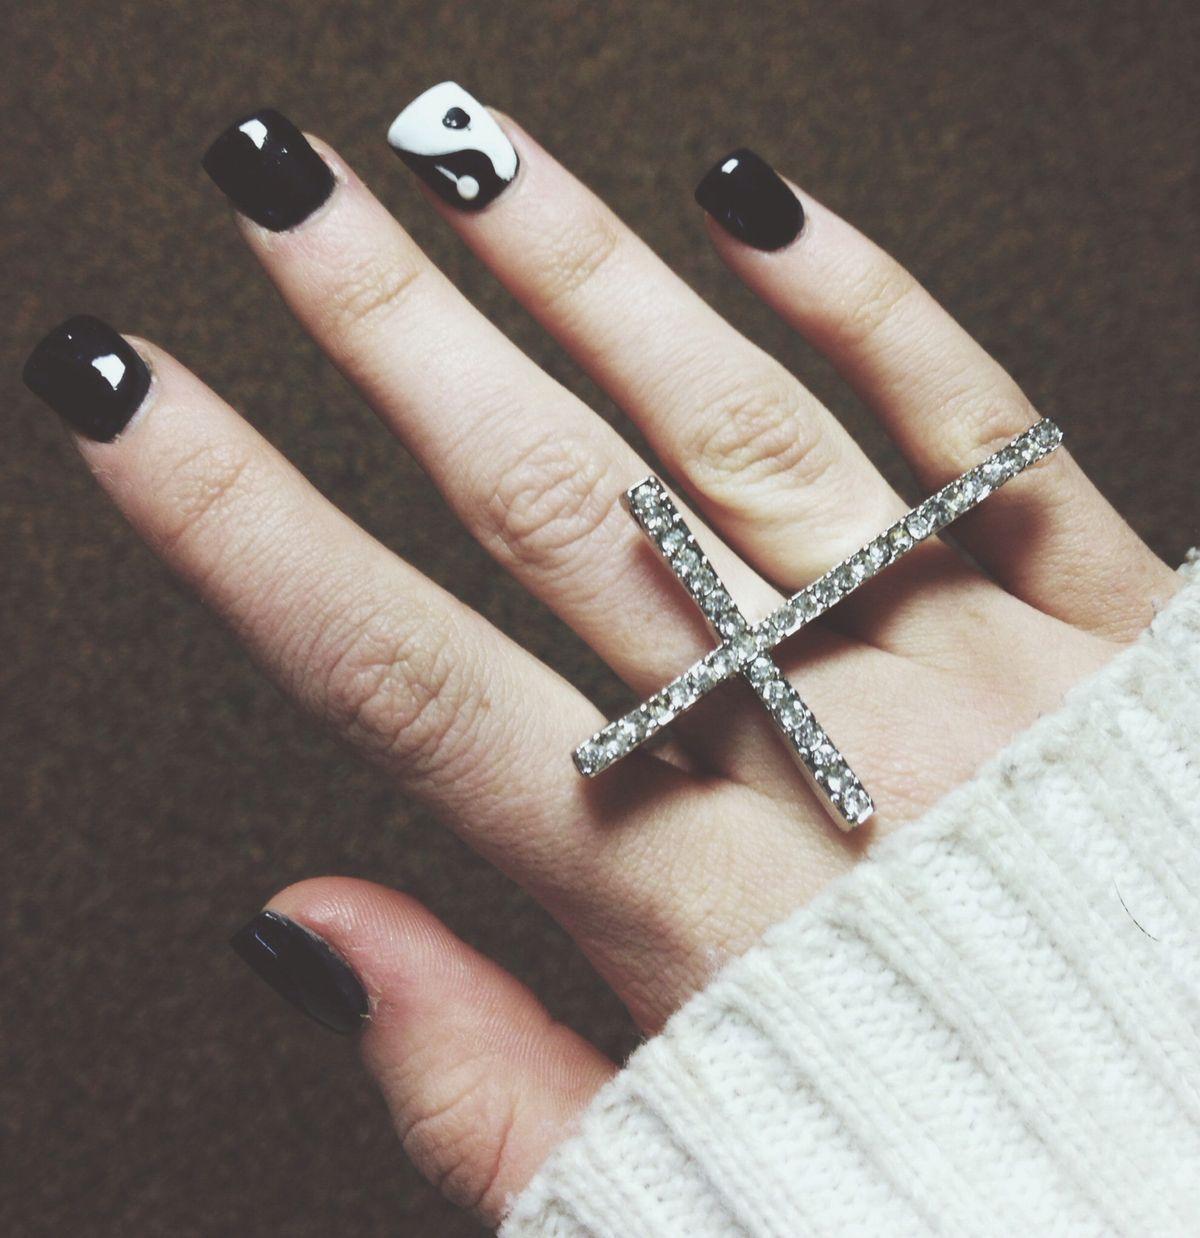 Pin by sarah ♡ on *мanιѕ and pedιѕ*❥ | Pinterest